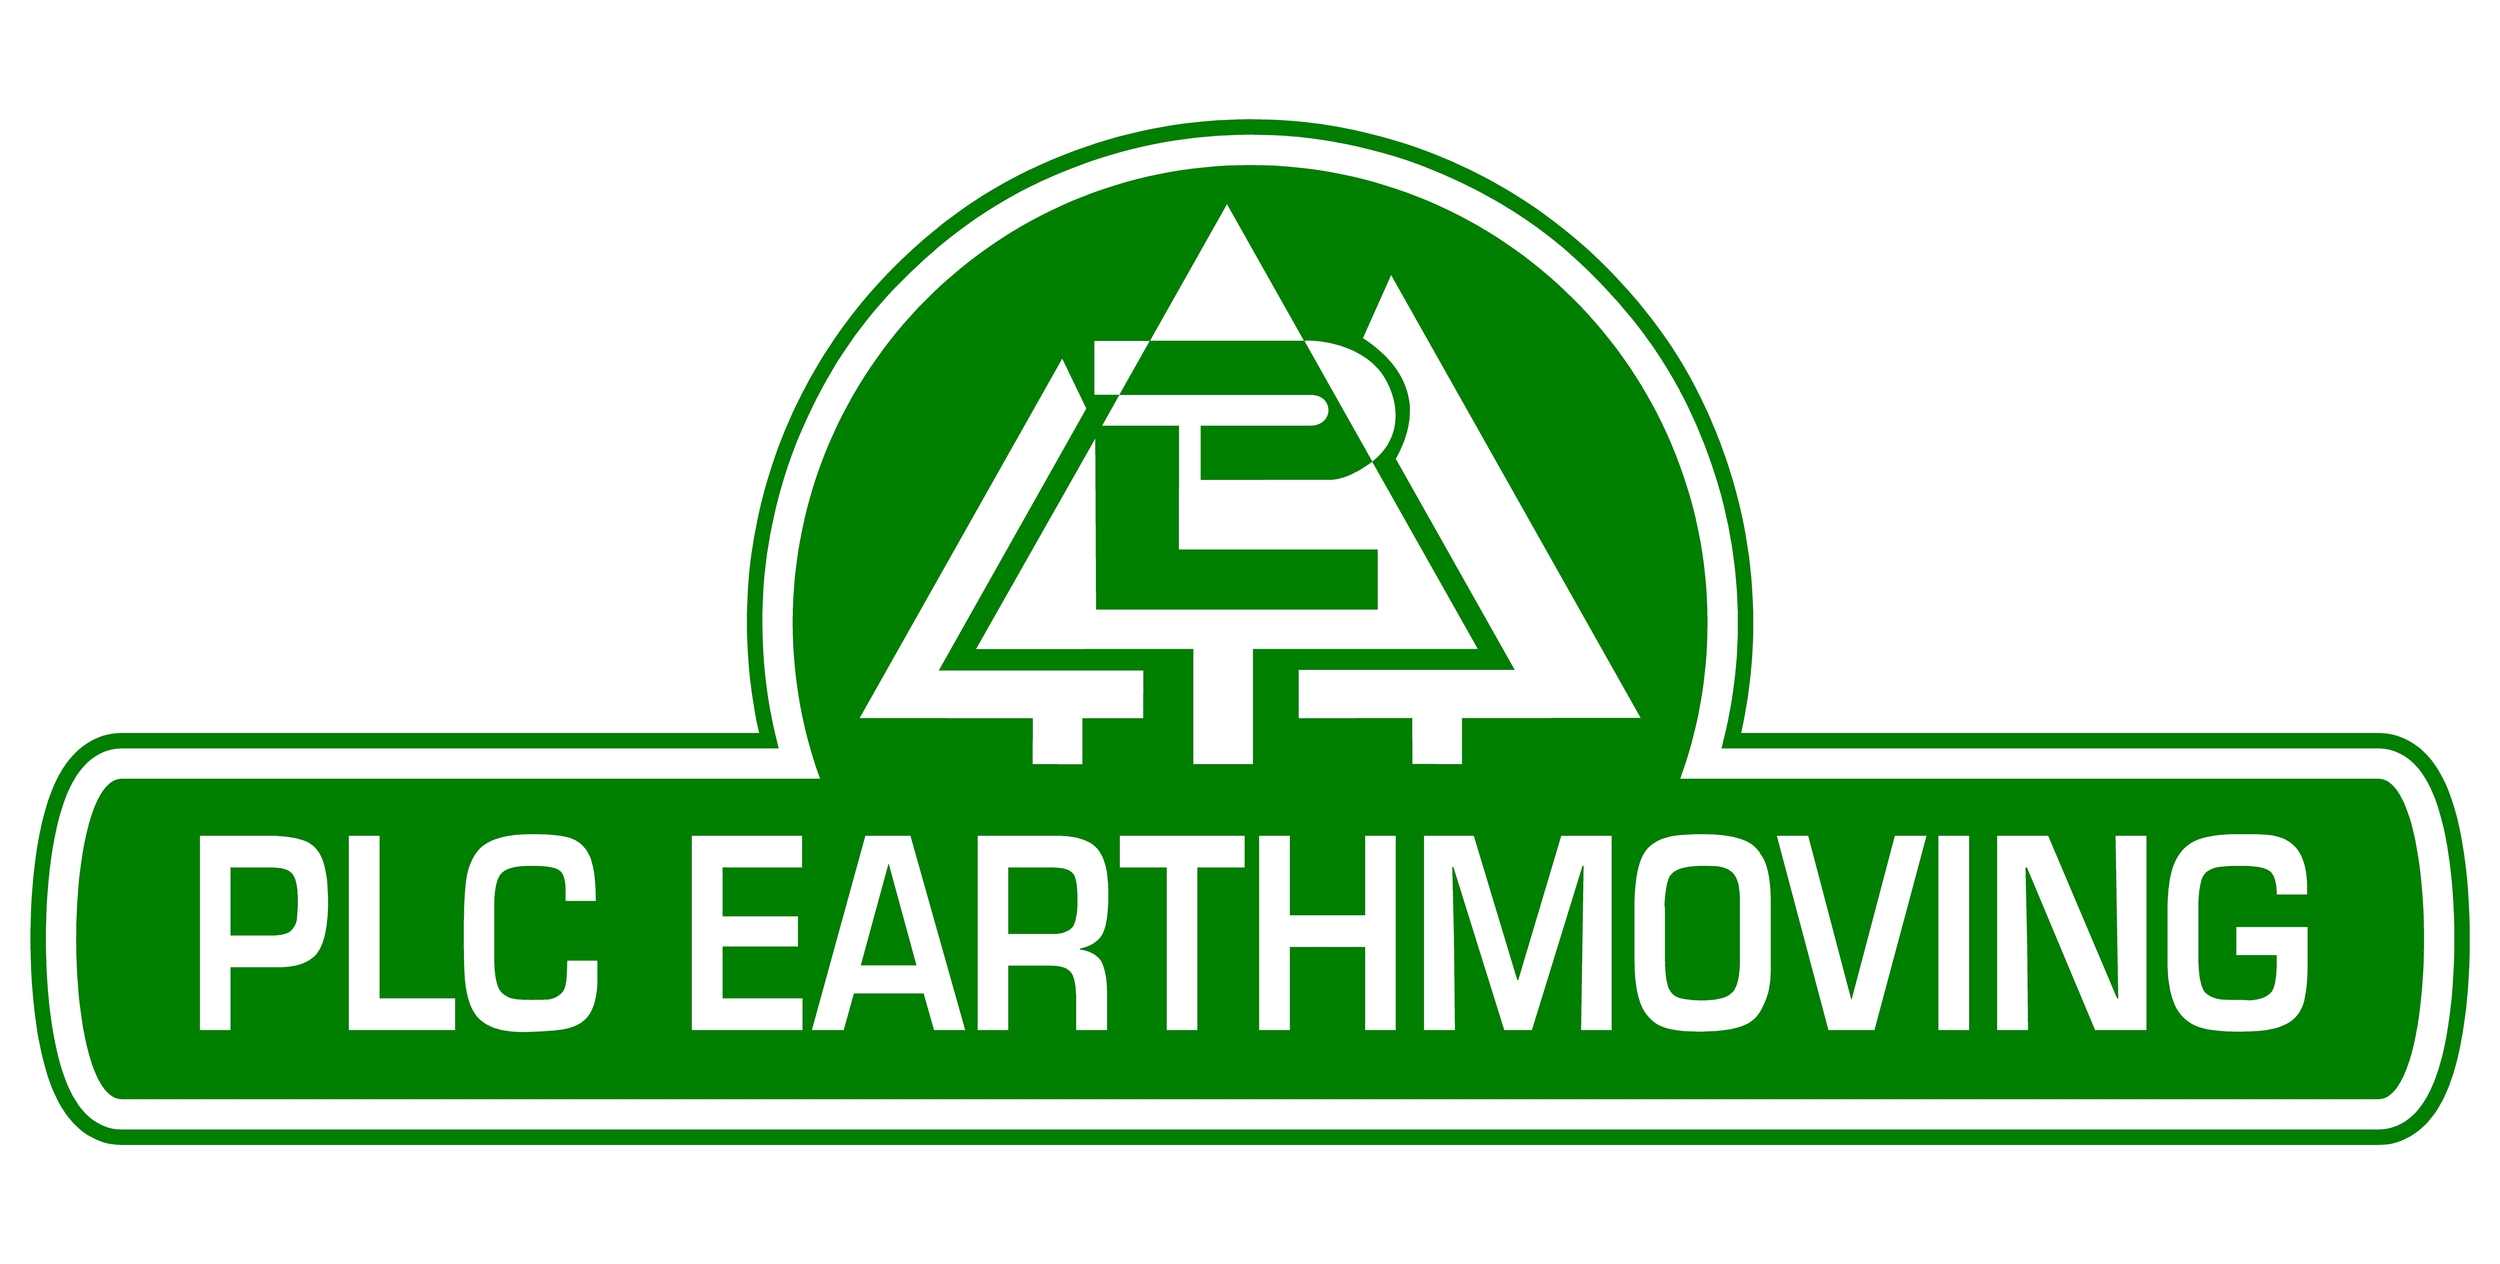 PLC Earthmoving.jpg